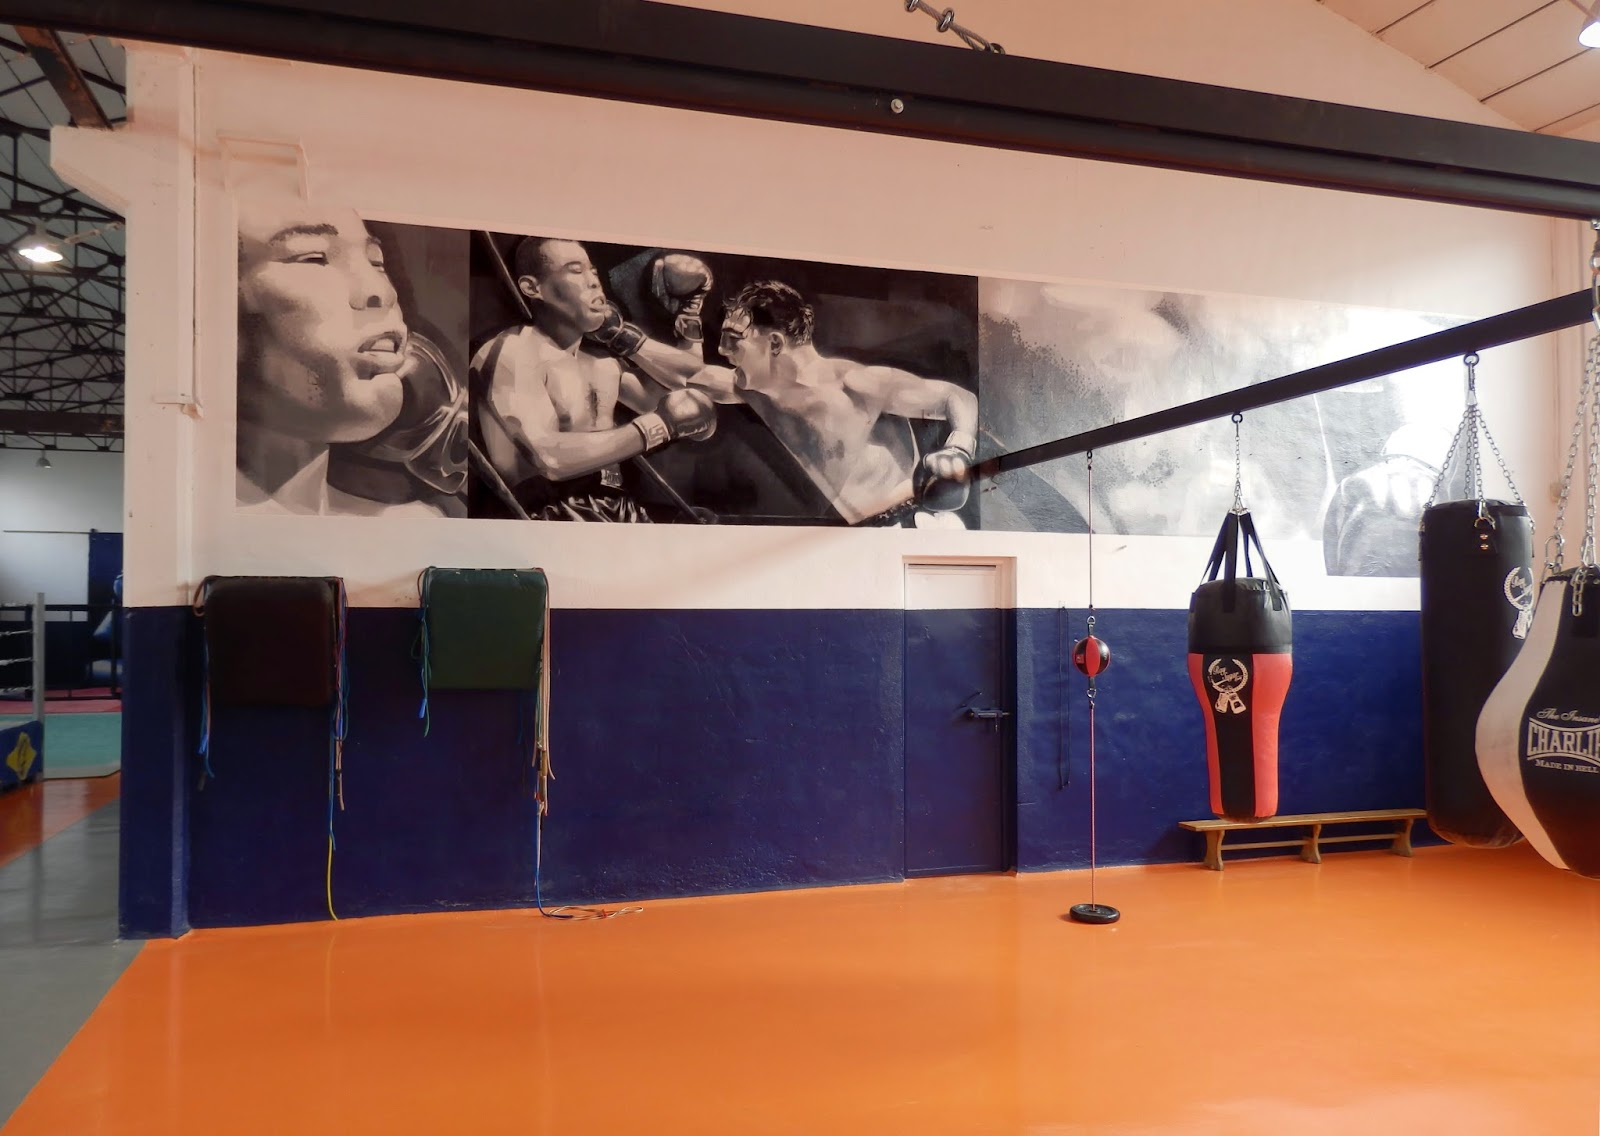 Gimnasio gasteiz sport fill in culture - Decoracion de gimnasios ...